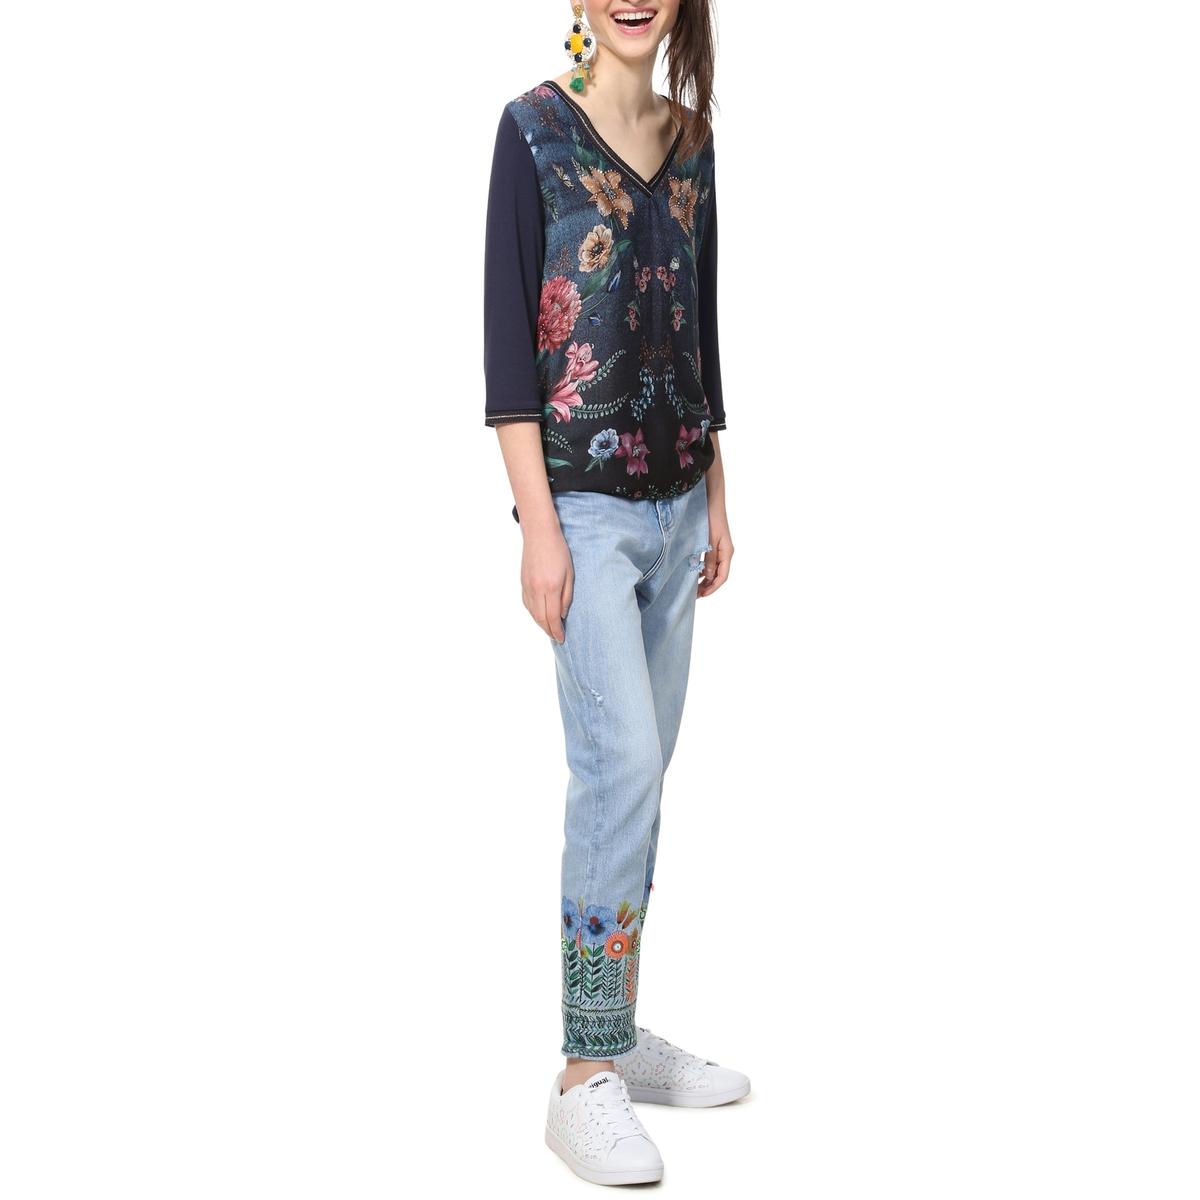 Camiseta de magna larga Nez, con estampado de flores